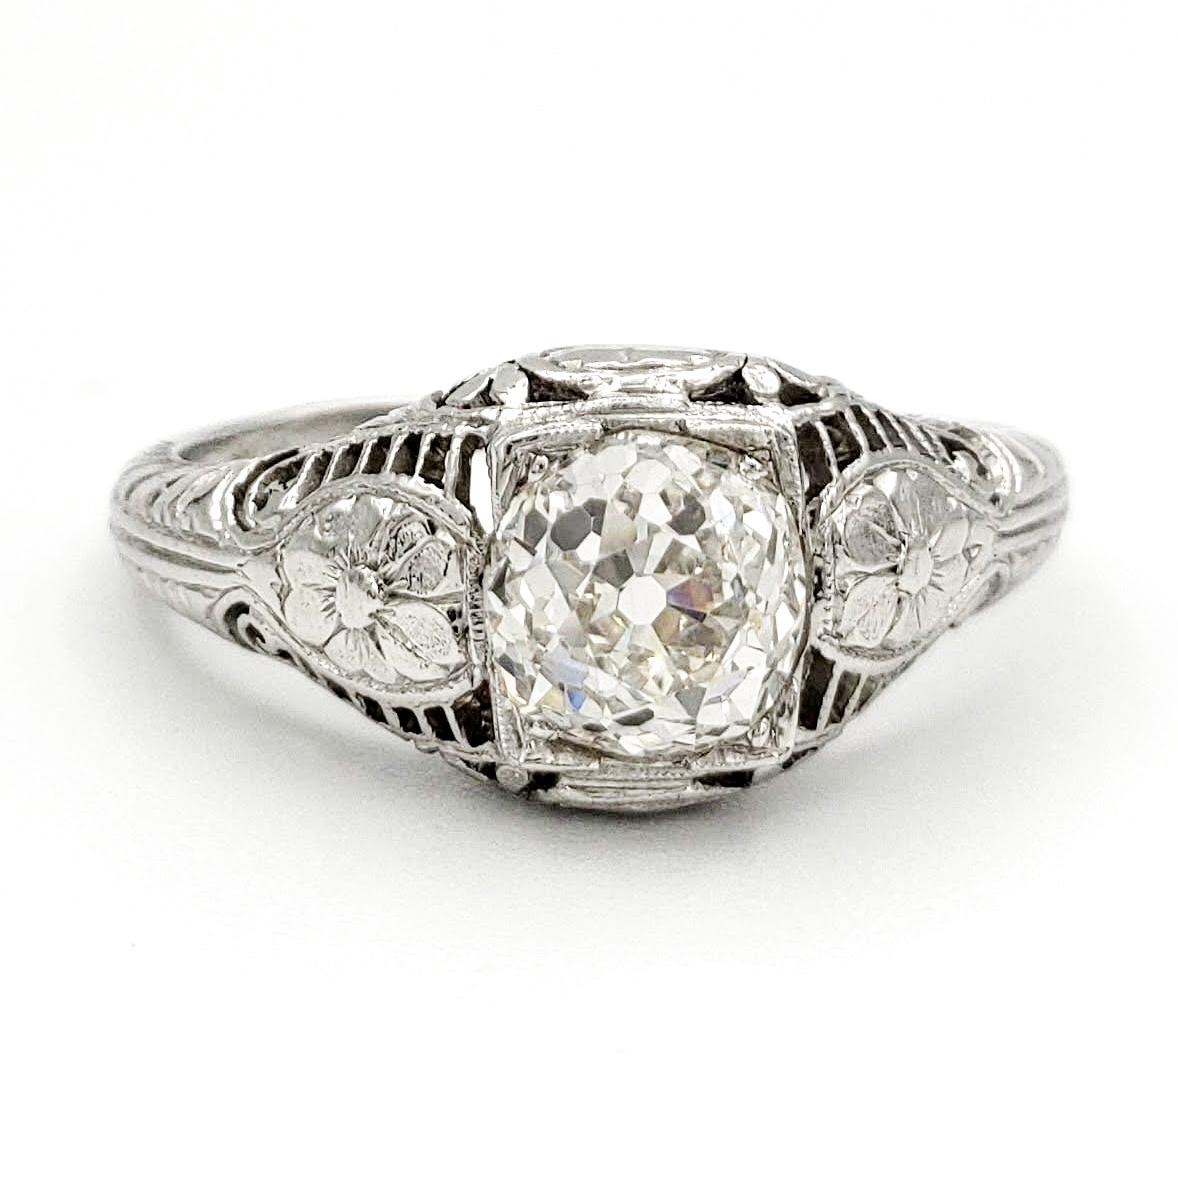 vintage-platinum-engagement-ring-with-1-02-carat-old-european-cut-diamond-egl-h-si1